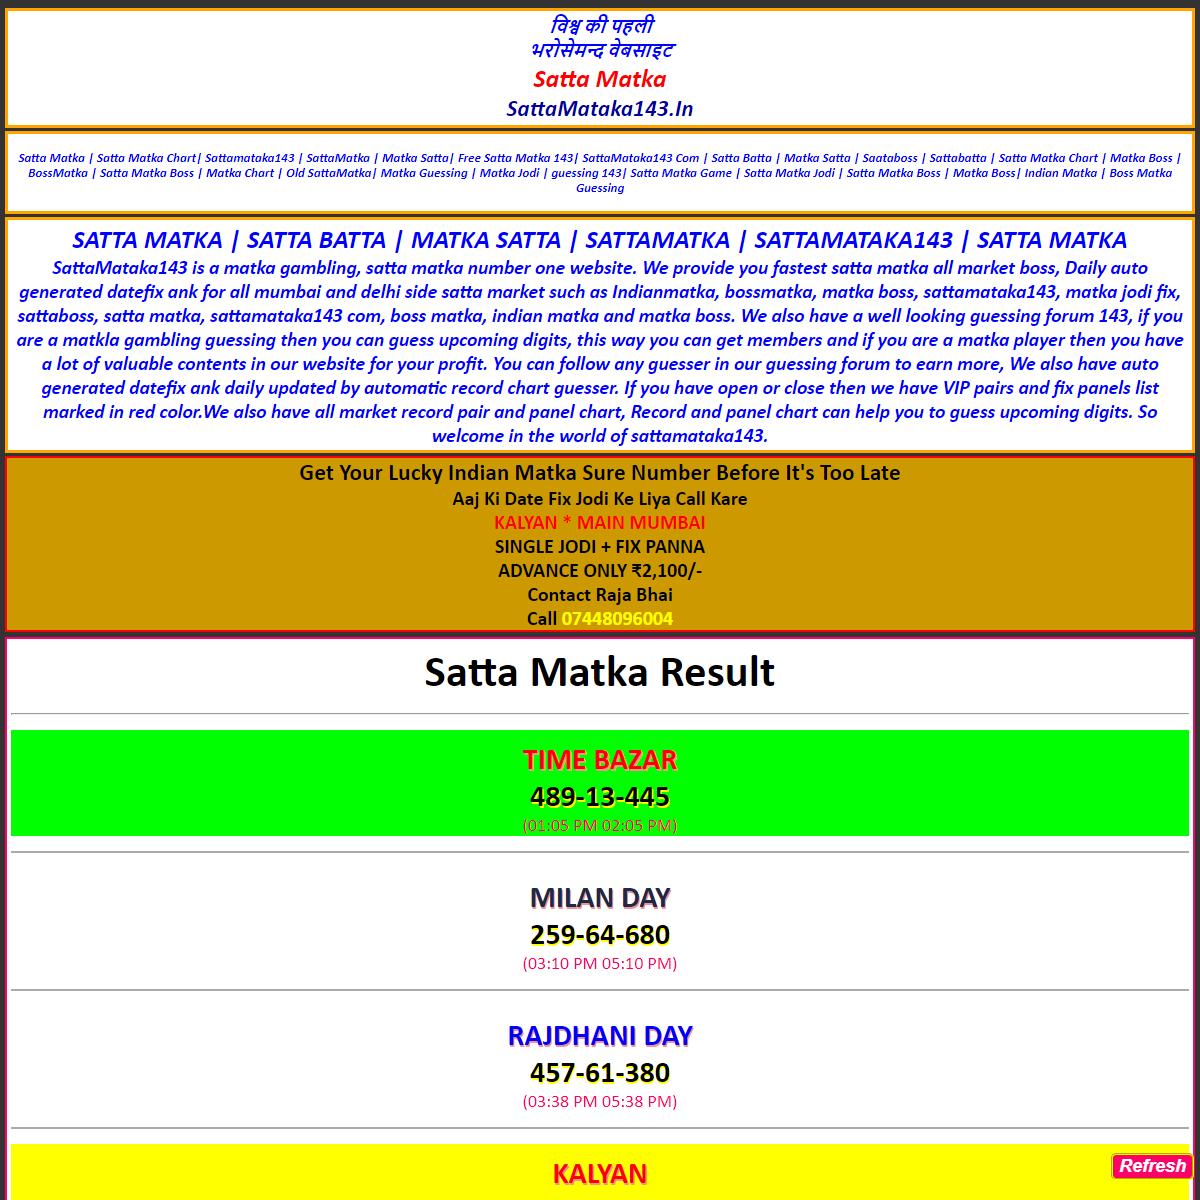 SATTA MATKA - MATKA BOSS - SATTAMATAKA143 - SATTAMATAKA143 COM - SATTAMATKA - SATTA MATKA CHART - SATTAMATAKA143.IN